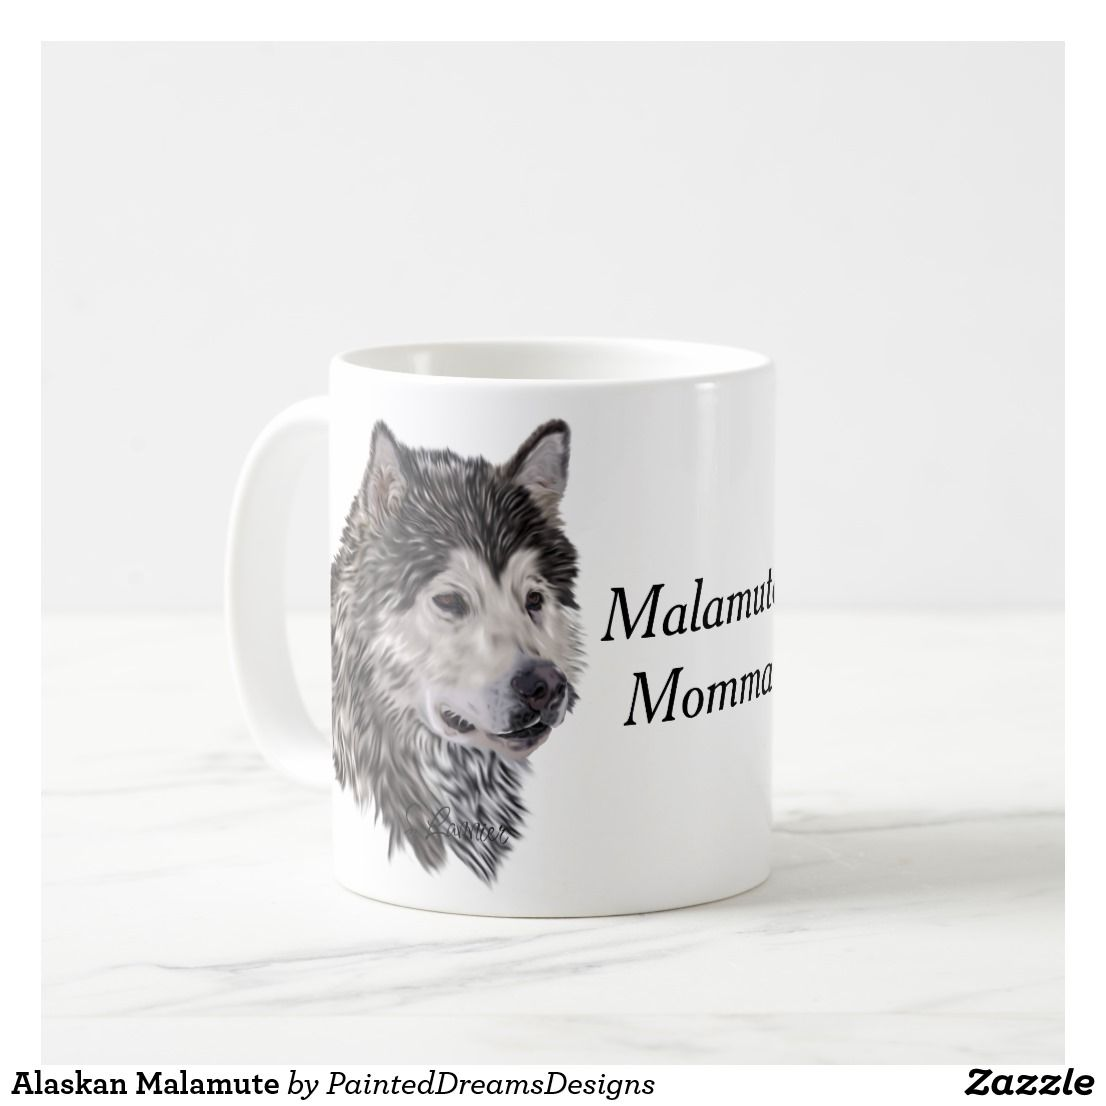 Alaskan Malamute Coffee Mug Mugs Alaskan Malamute Malamute